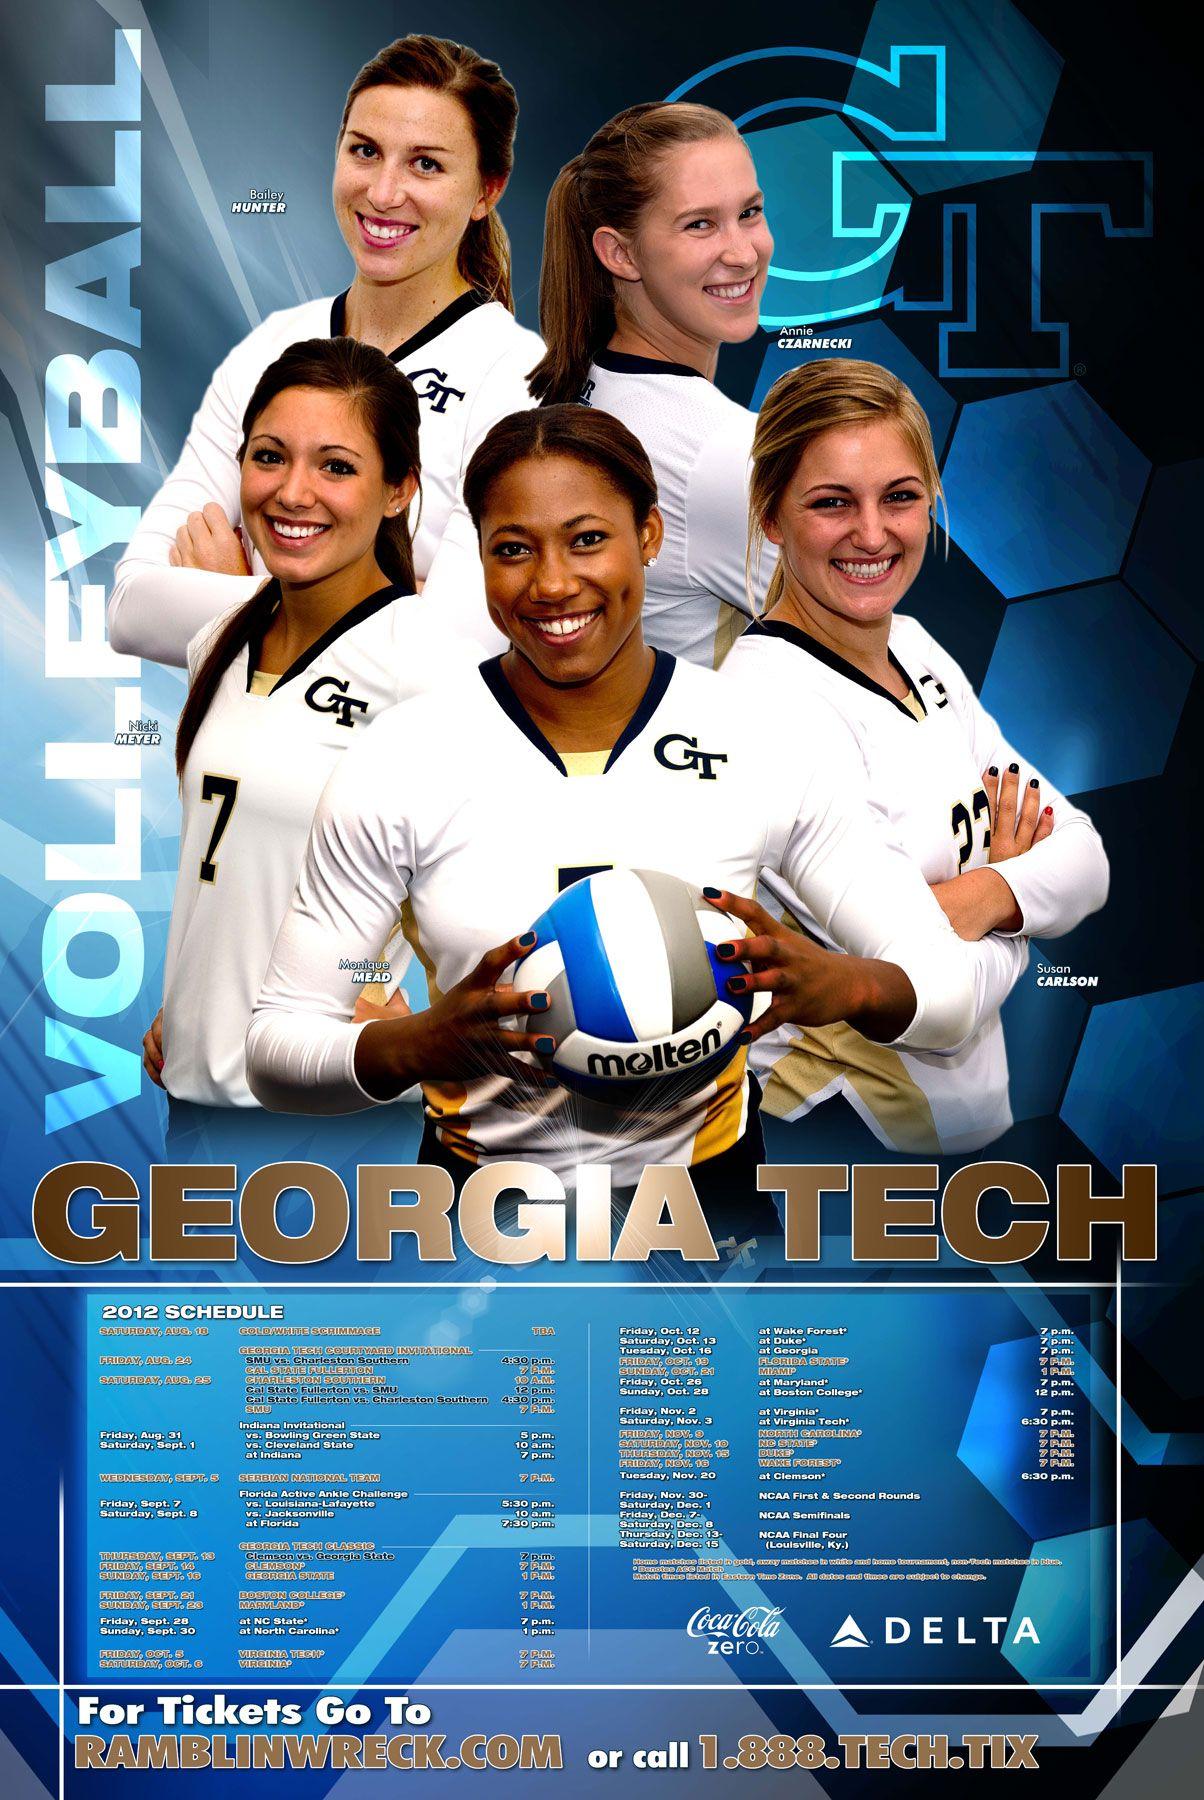 2012 Georgia Tech Volleyball Poster Copa America Centenario Copa America 2016 Volleyball Posters